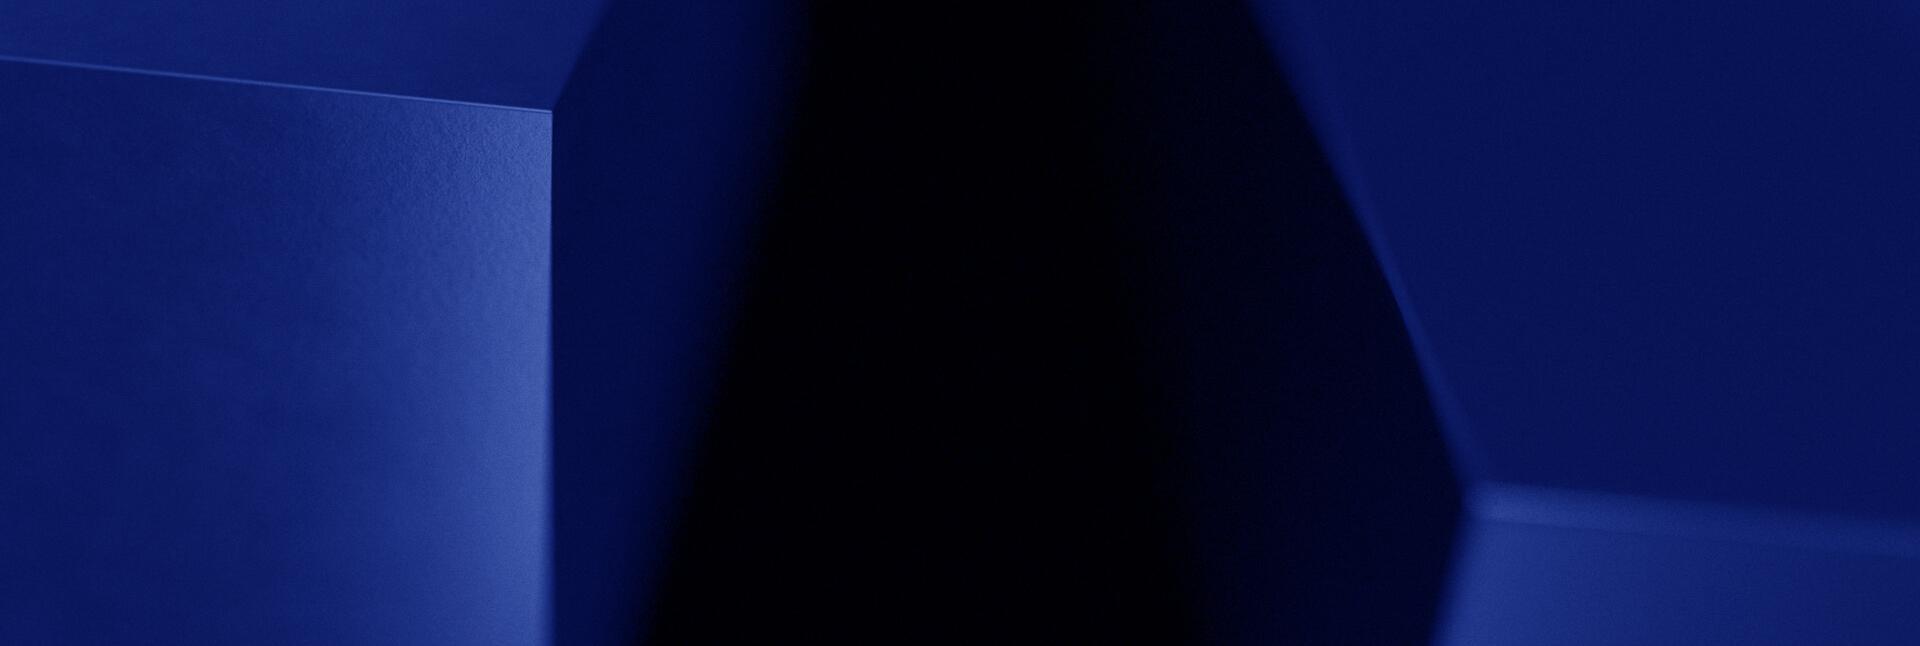 rra-background-blue-3-2021.jpg